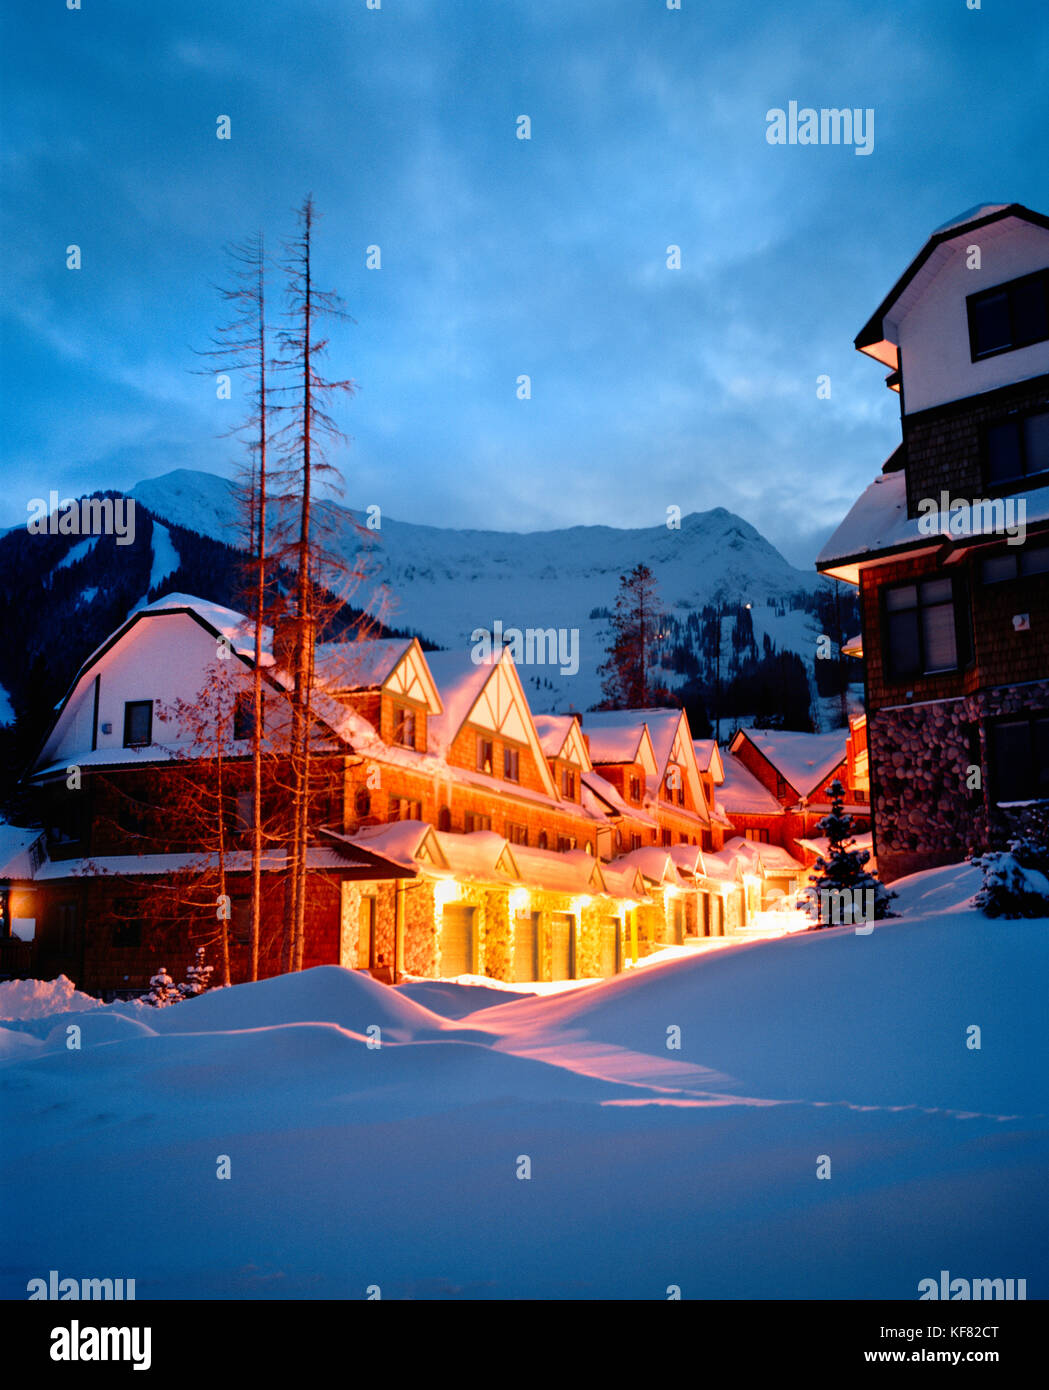 CANADA, BC Rockies, Lizard Creek Lodge at Fernie Alpine Ski Area - Stock Image